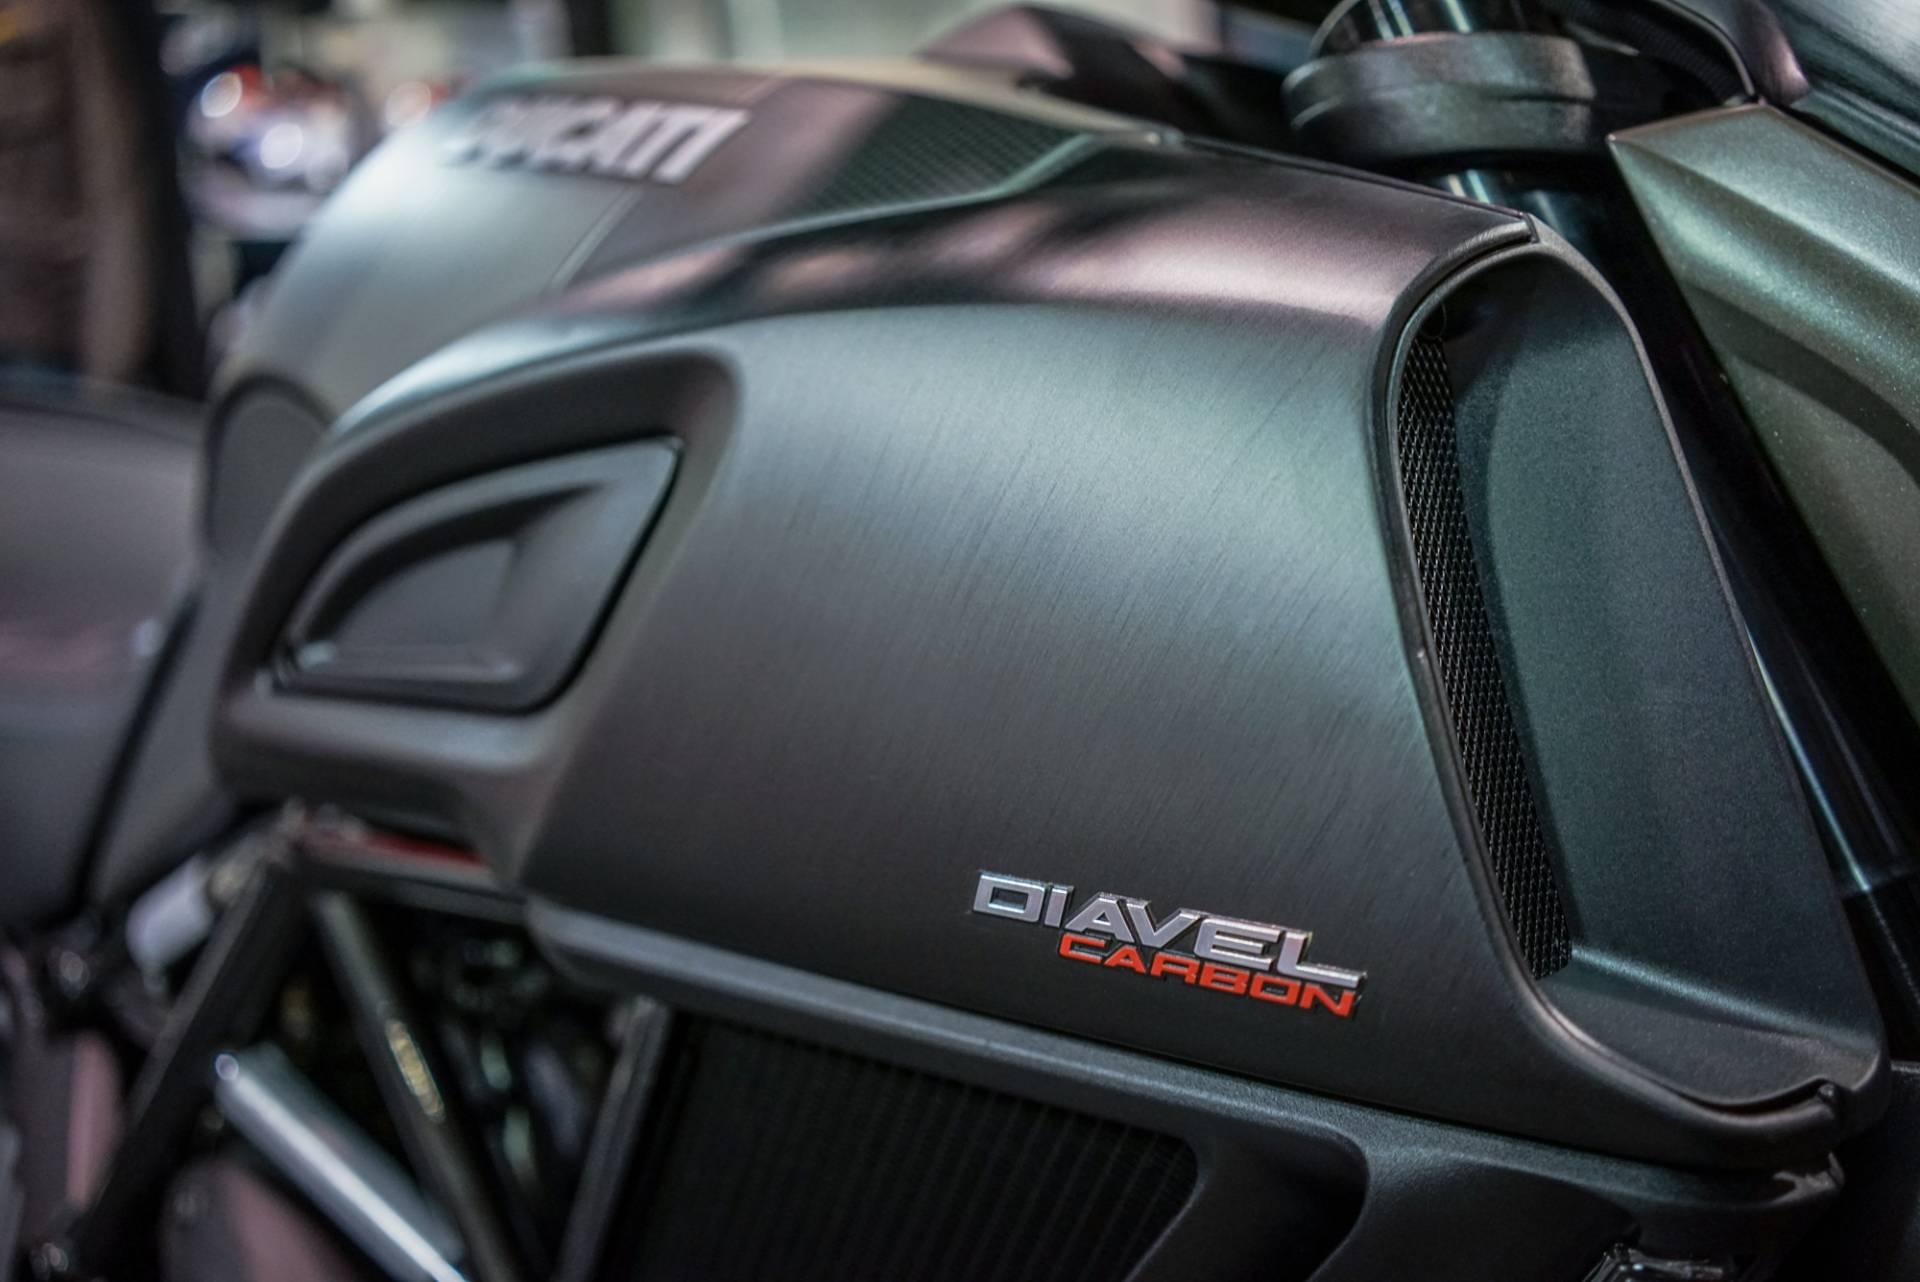 New 2018 Ducati Diavel Carbon Motorcycles In Brea Ca